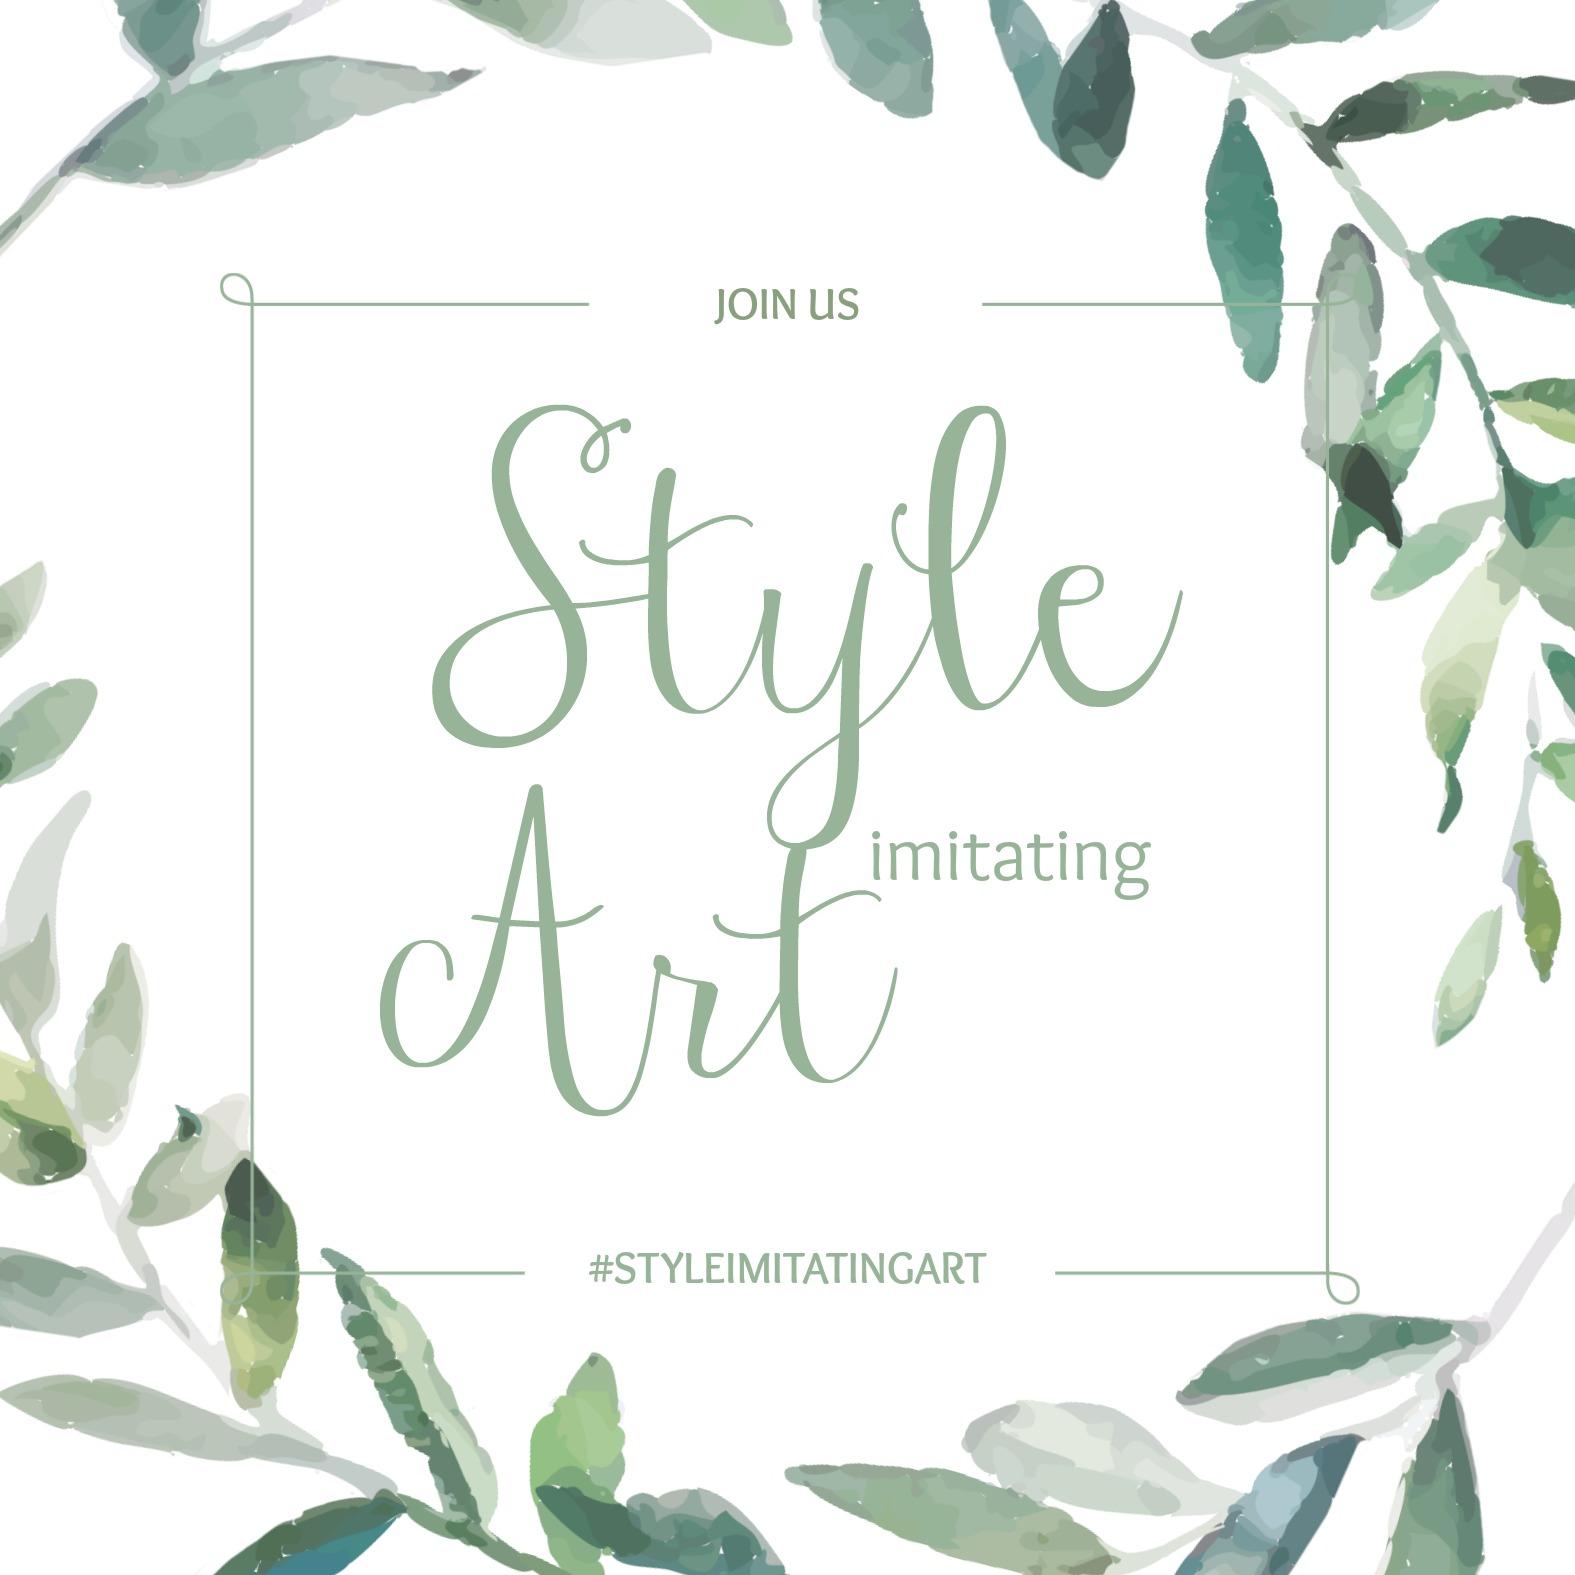 Style Imitating Art Invitation {living outside the stacks}